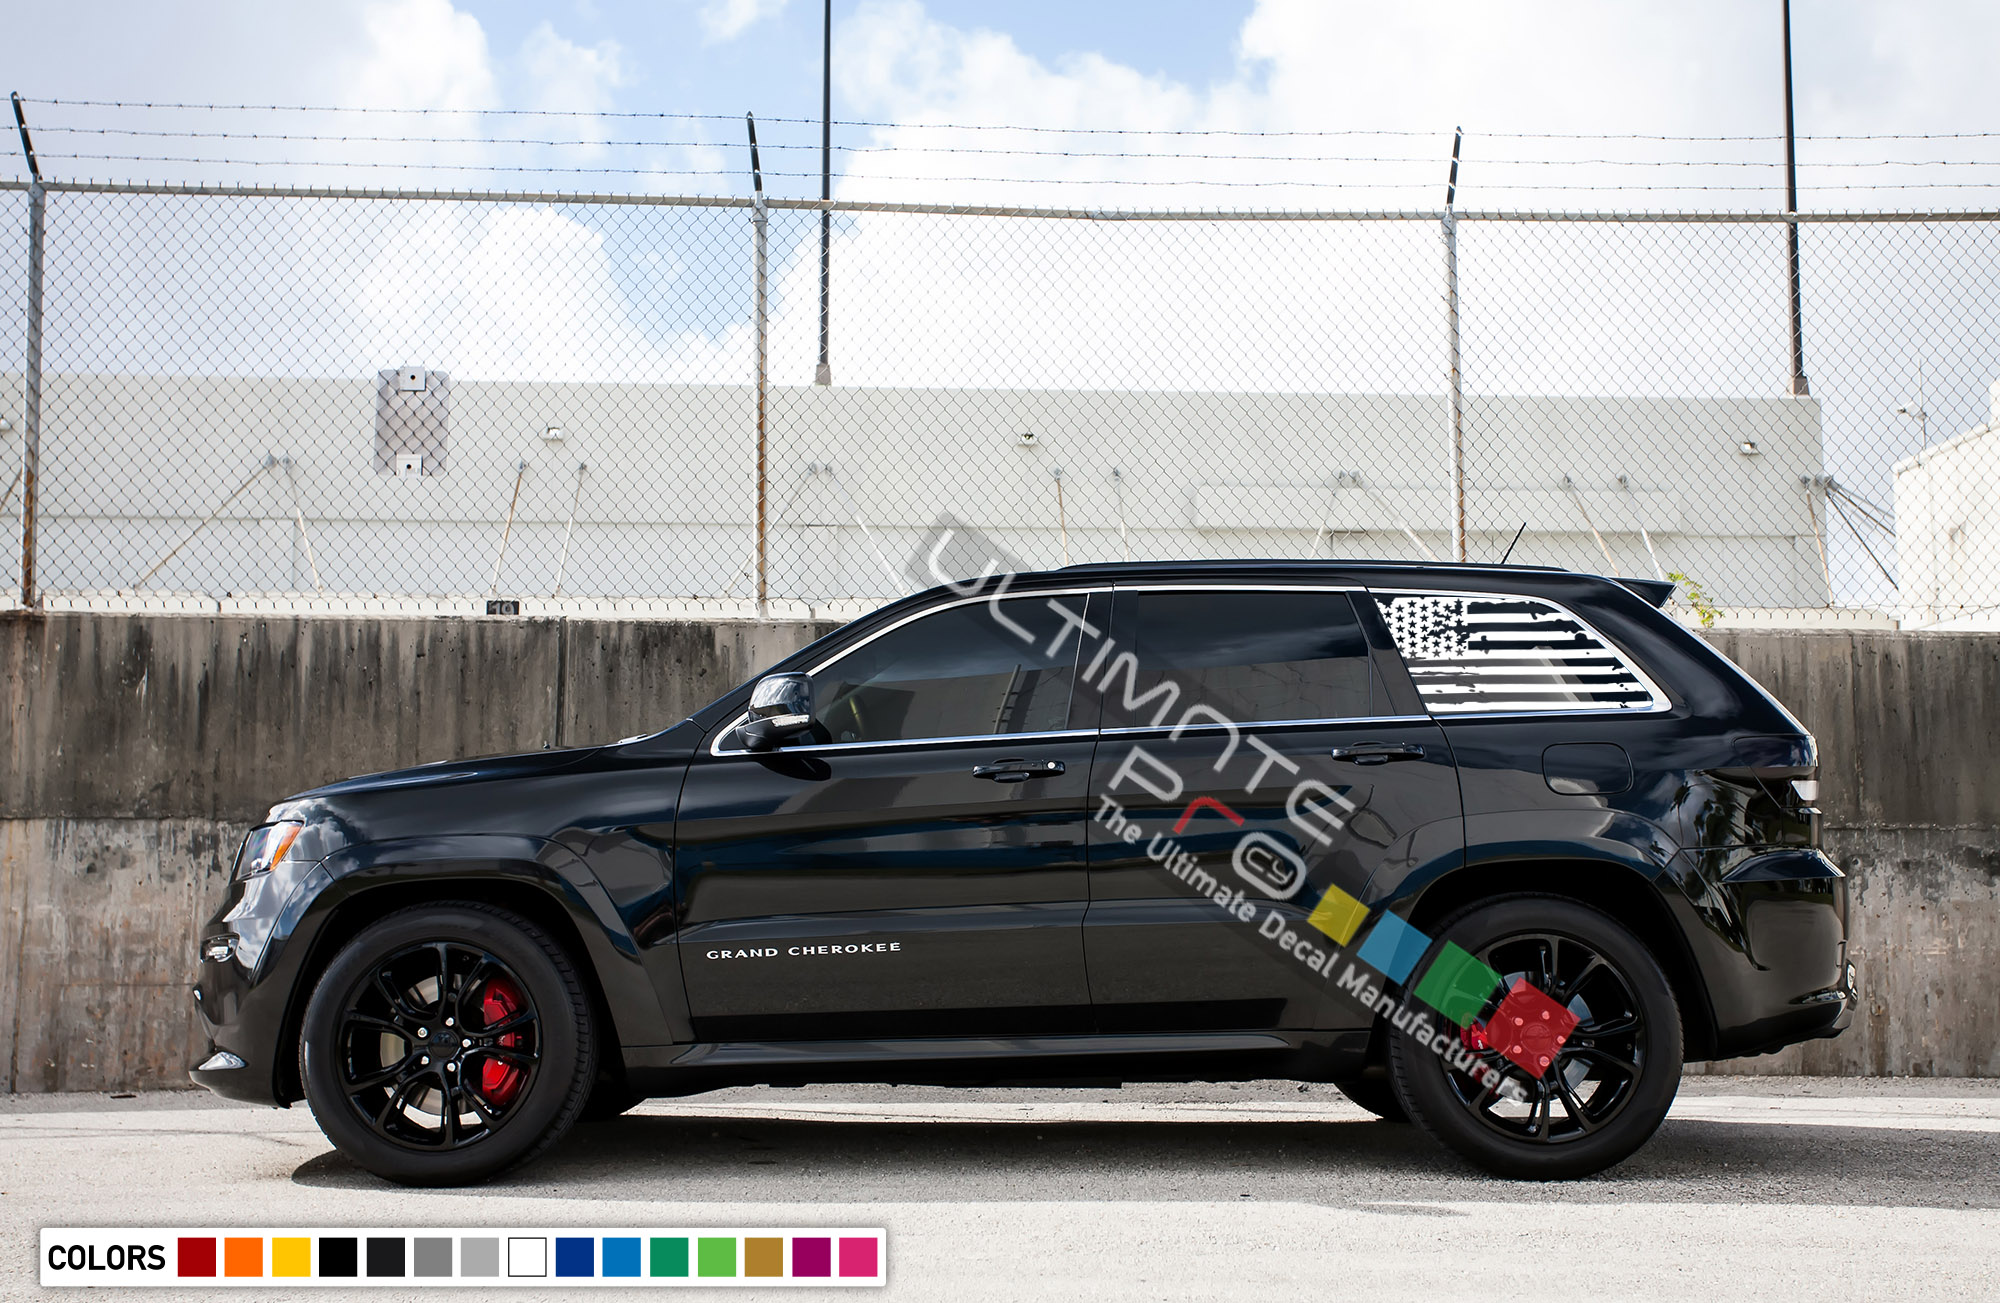 [DIAGRAM_5LK]  GY_7725] 2017 Jeep Cherokee Windshield Banner Wiring Diagram | 2017 Jeep Cherokee Windshield Banner |  | Ginou Sputa Oupli Pala Antus Tixat Rosz Trons Mohammedshrine Librar Wiring  101